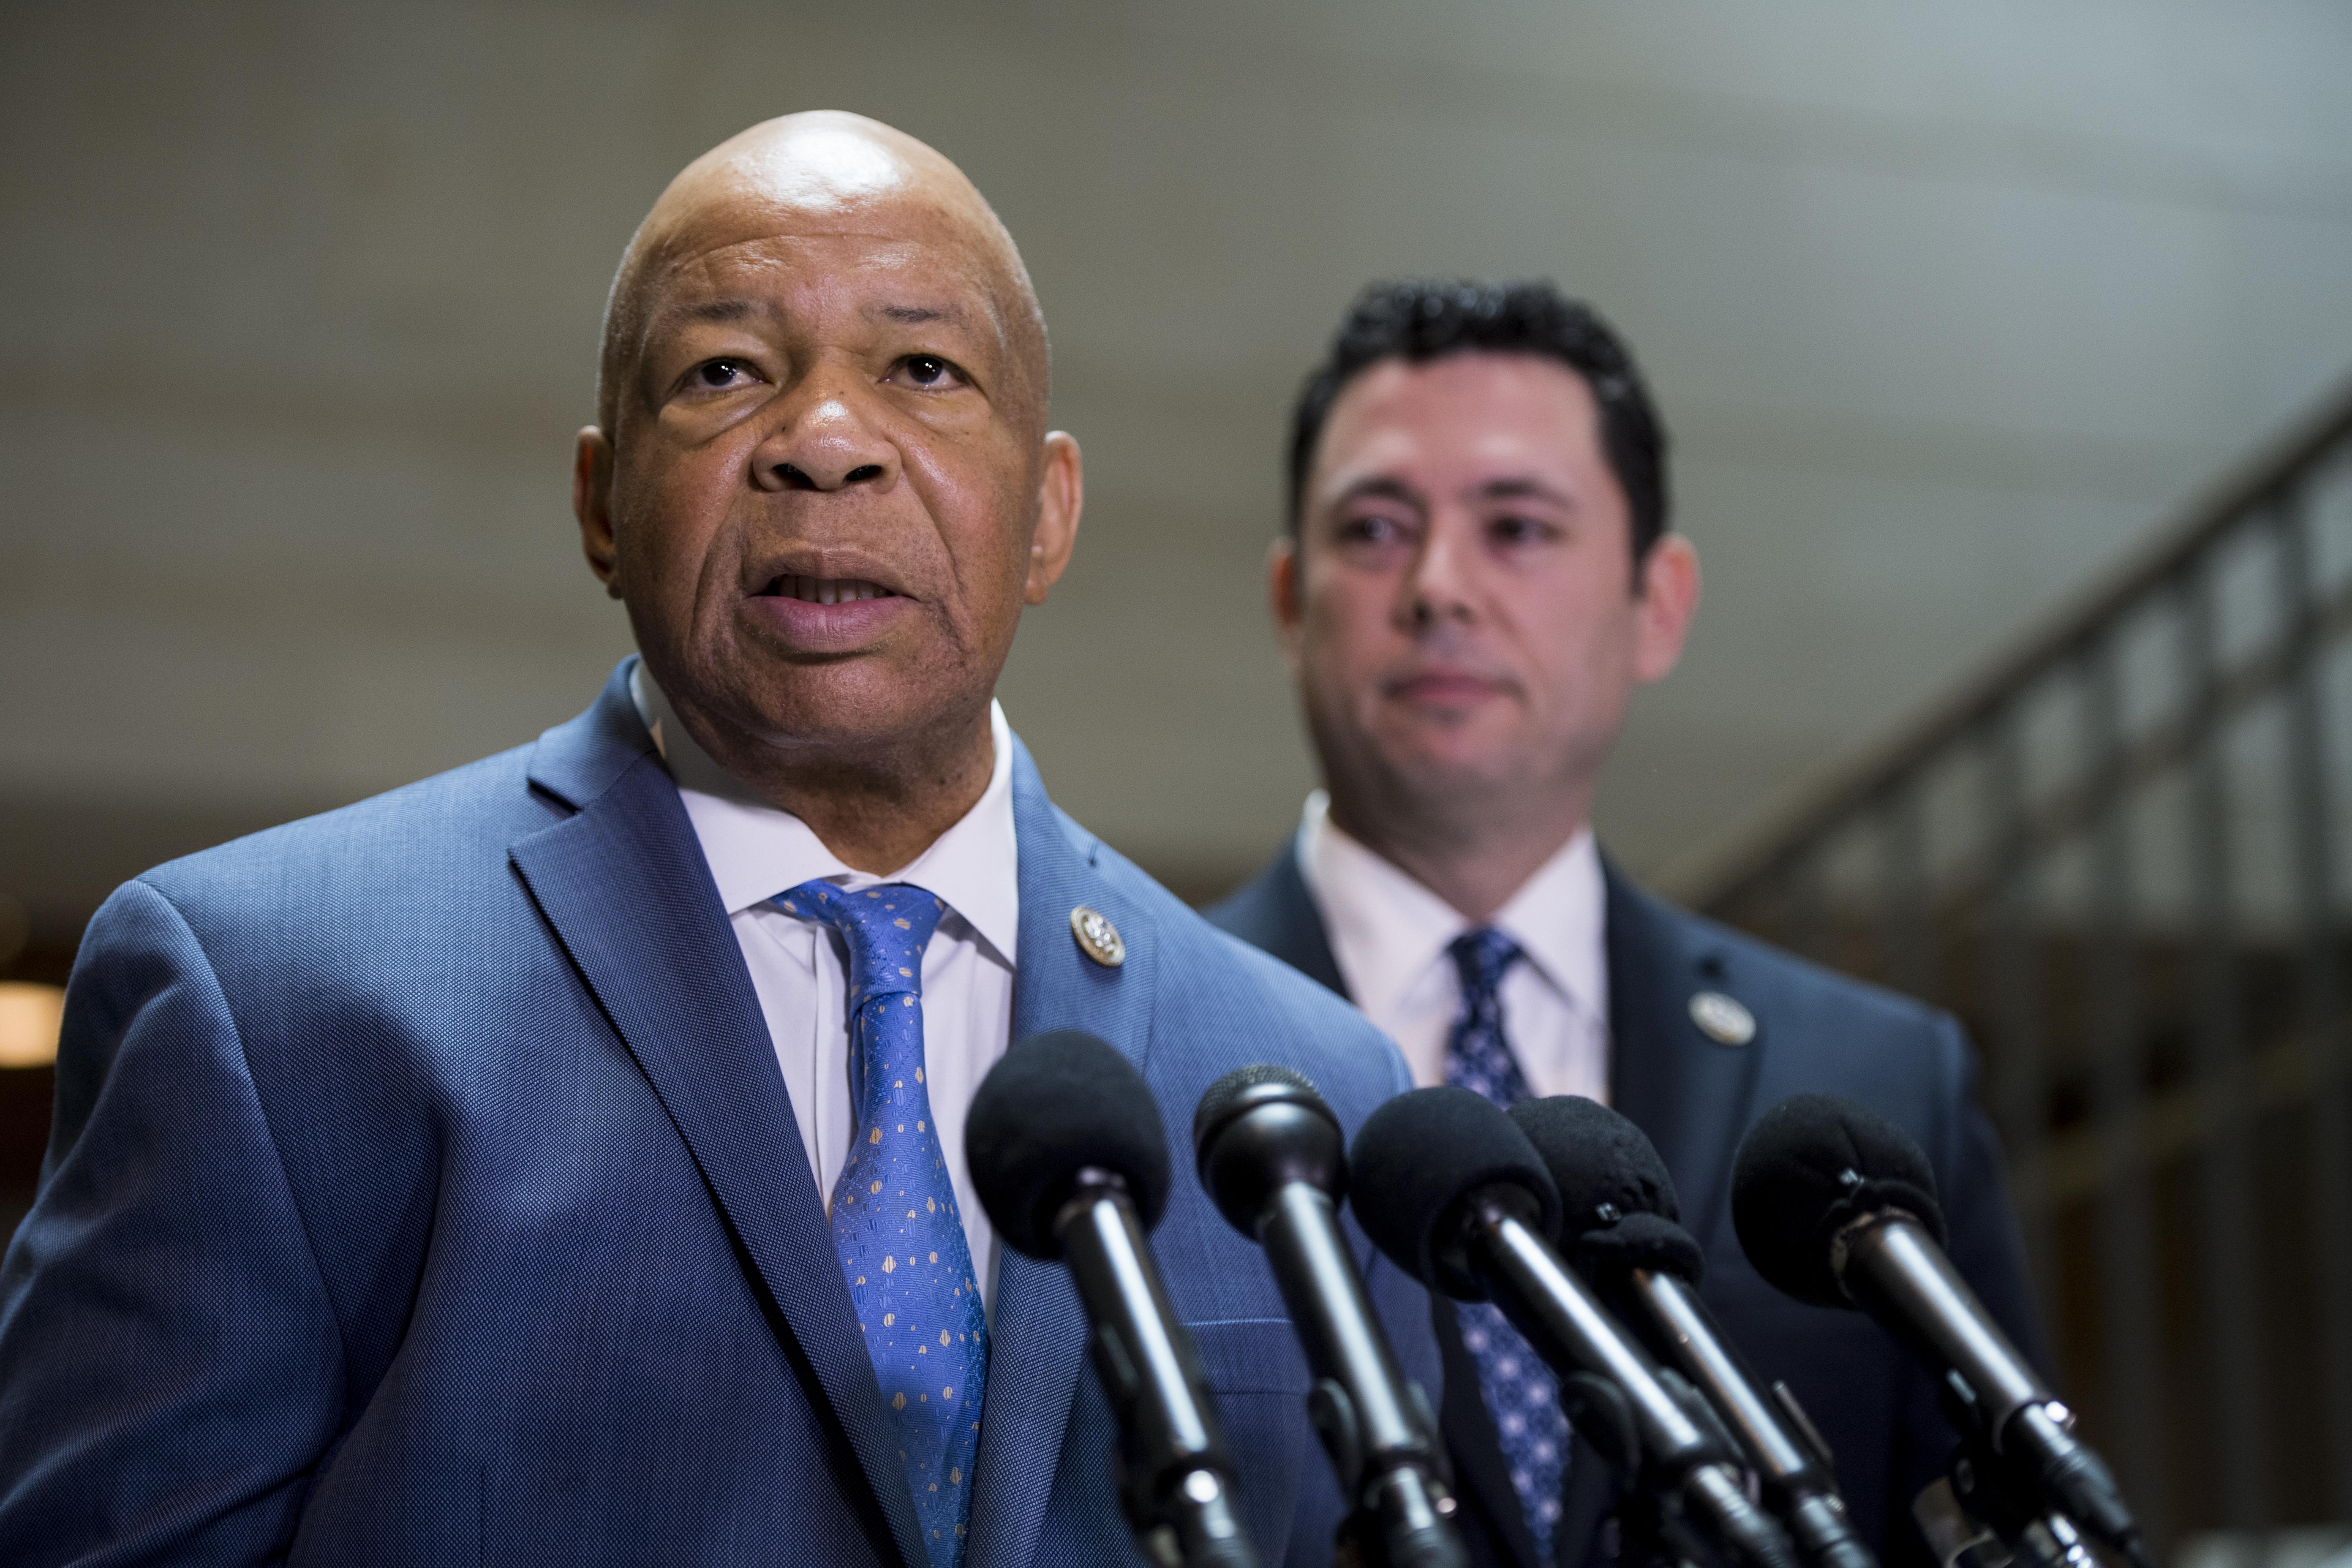 House Oversight Meeting on Michael Flynn